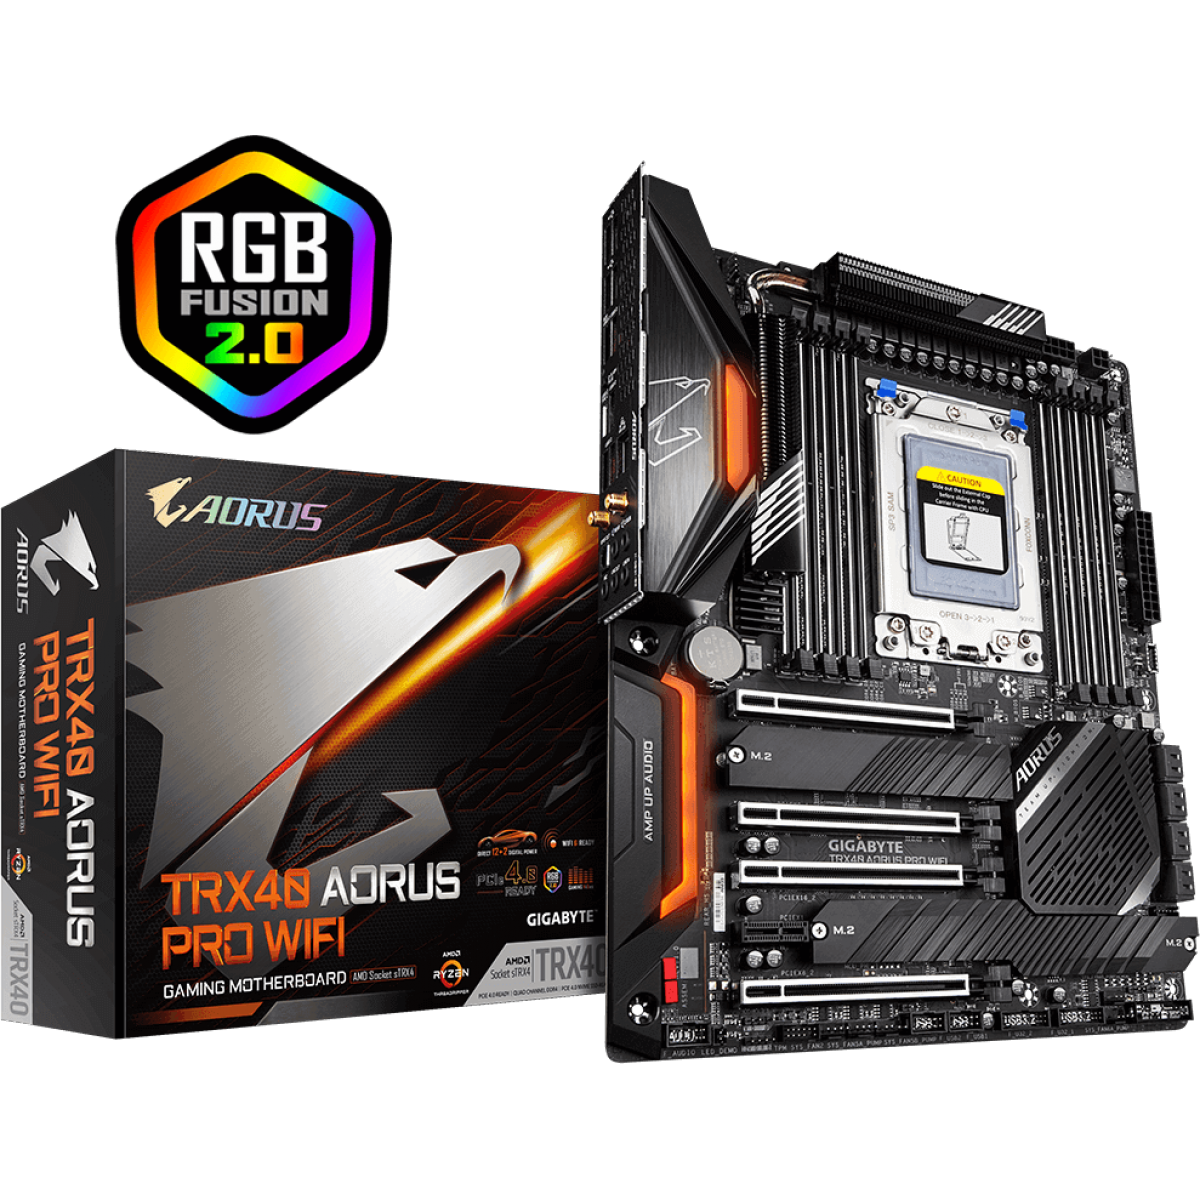 Placa Mãe Gigabyte TRX40 Aorus PRo Wifi, Chipset TRX40, AMD TRX4, ATX, DDR4